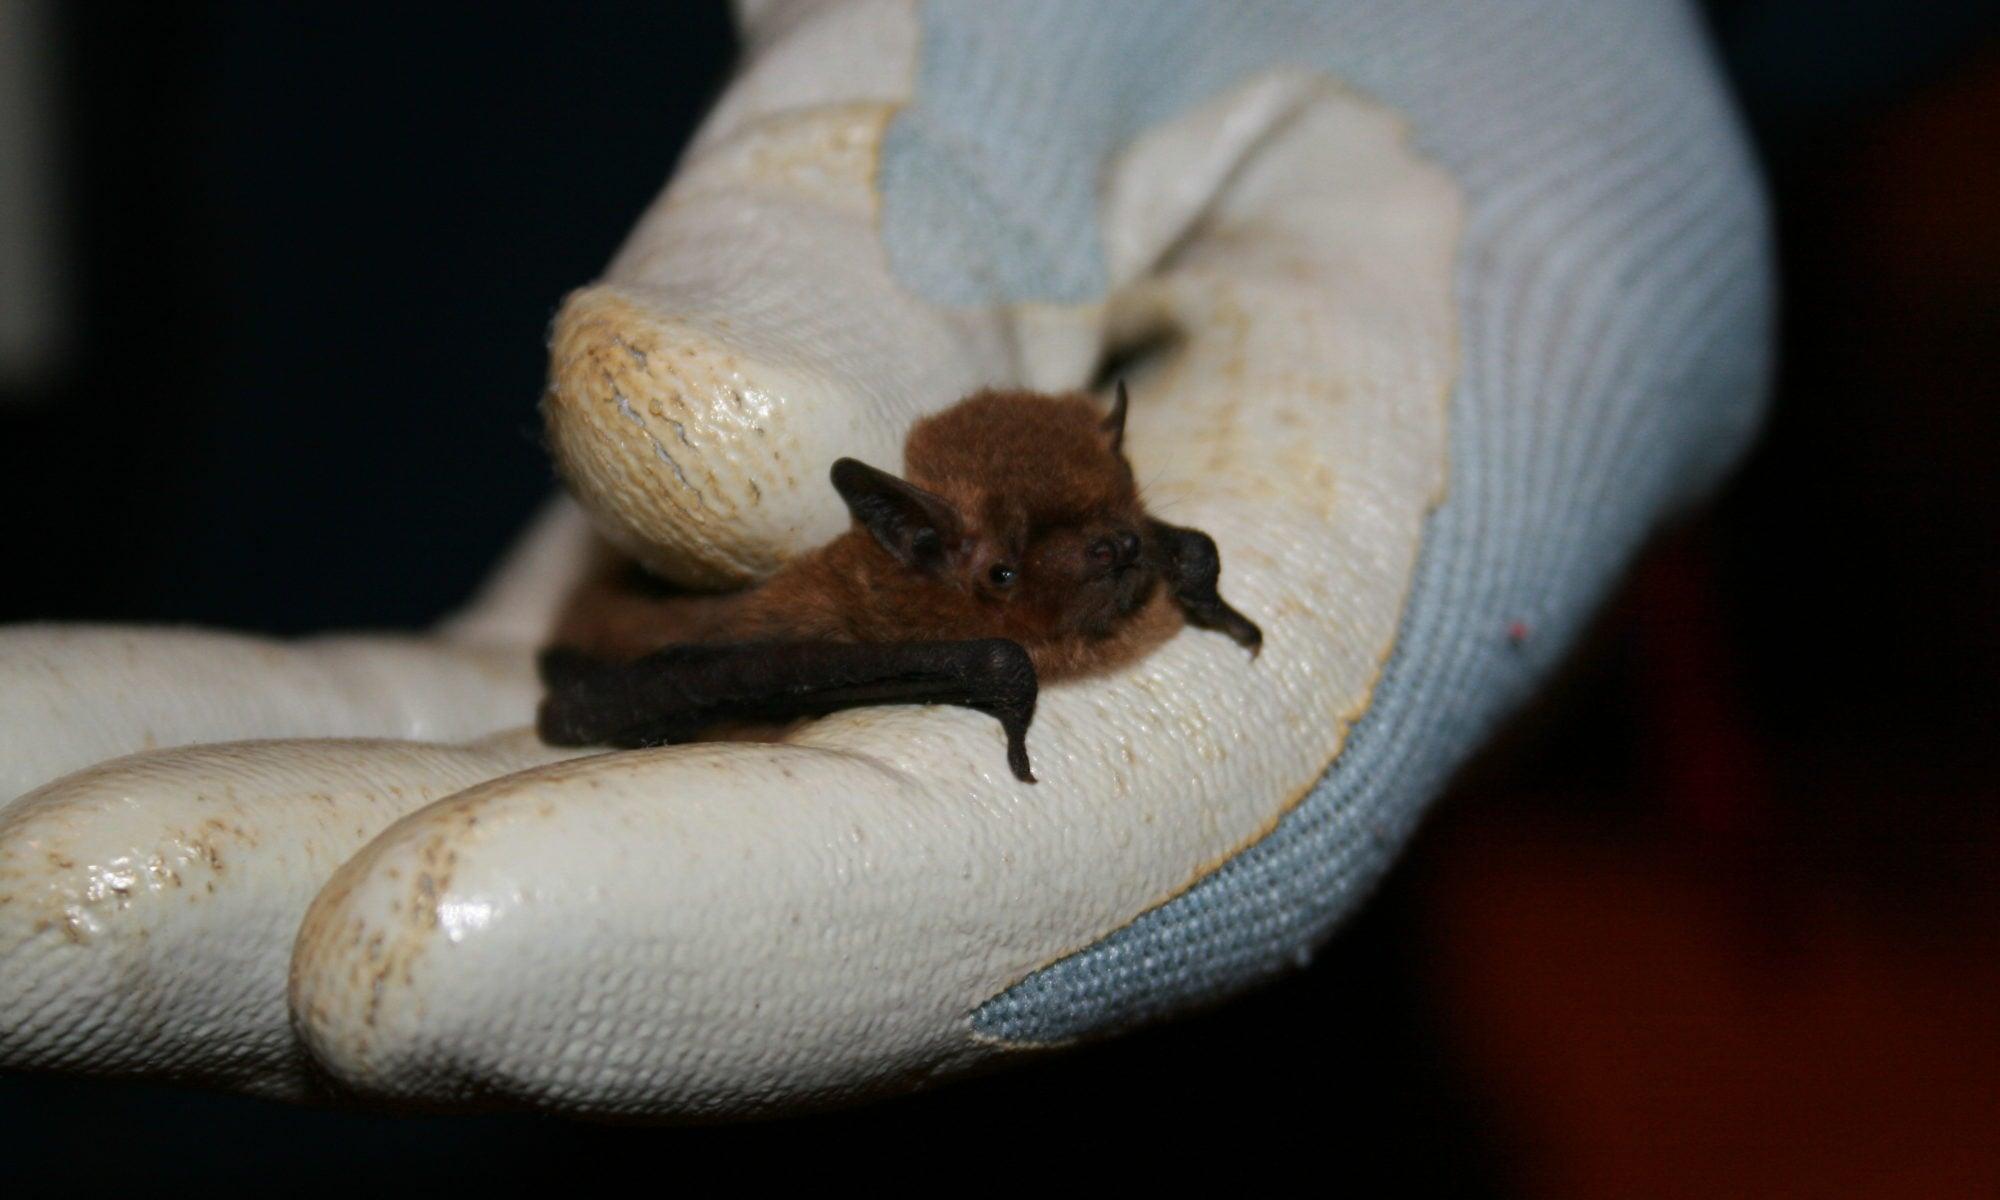 Bat caught in County Fermanagh